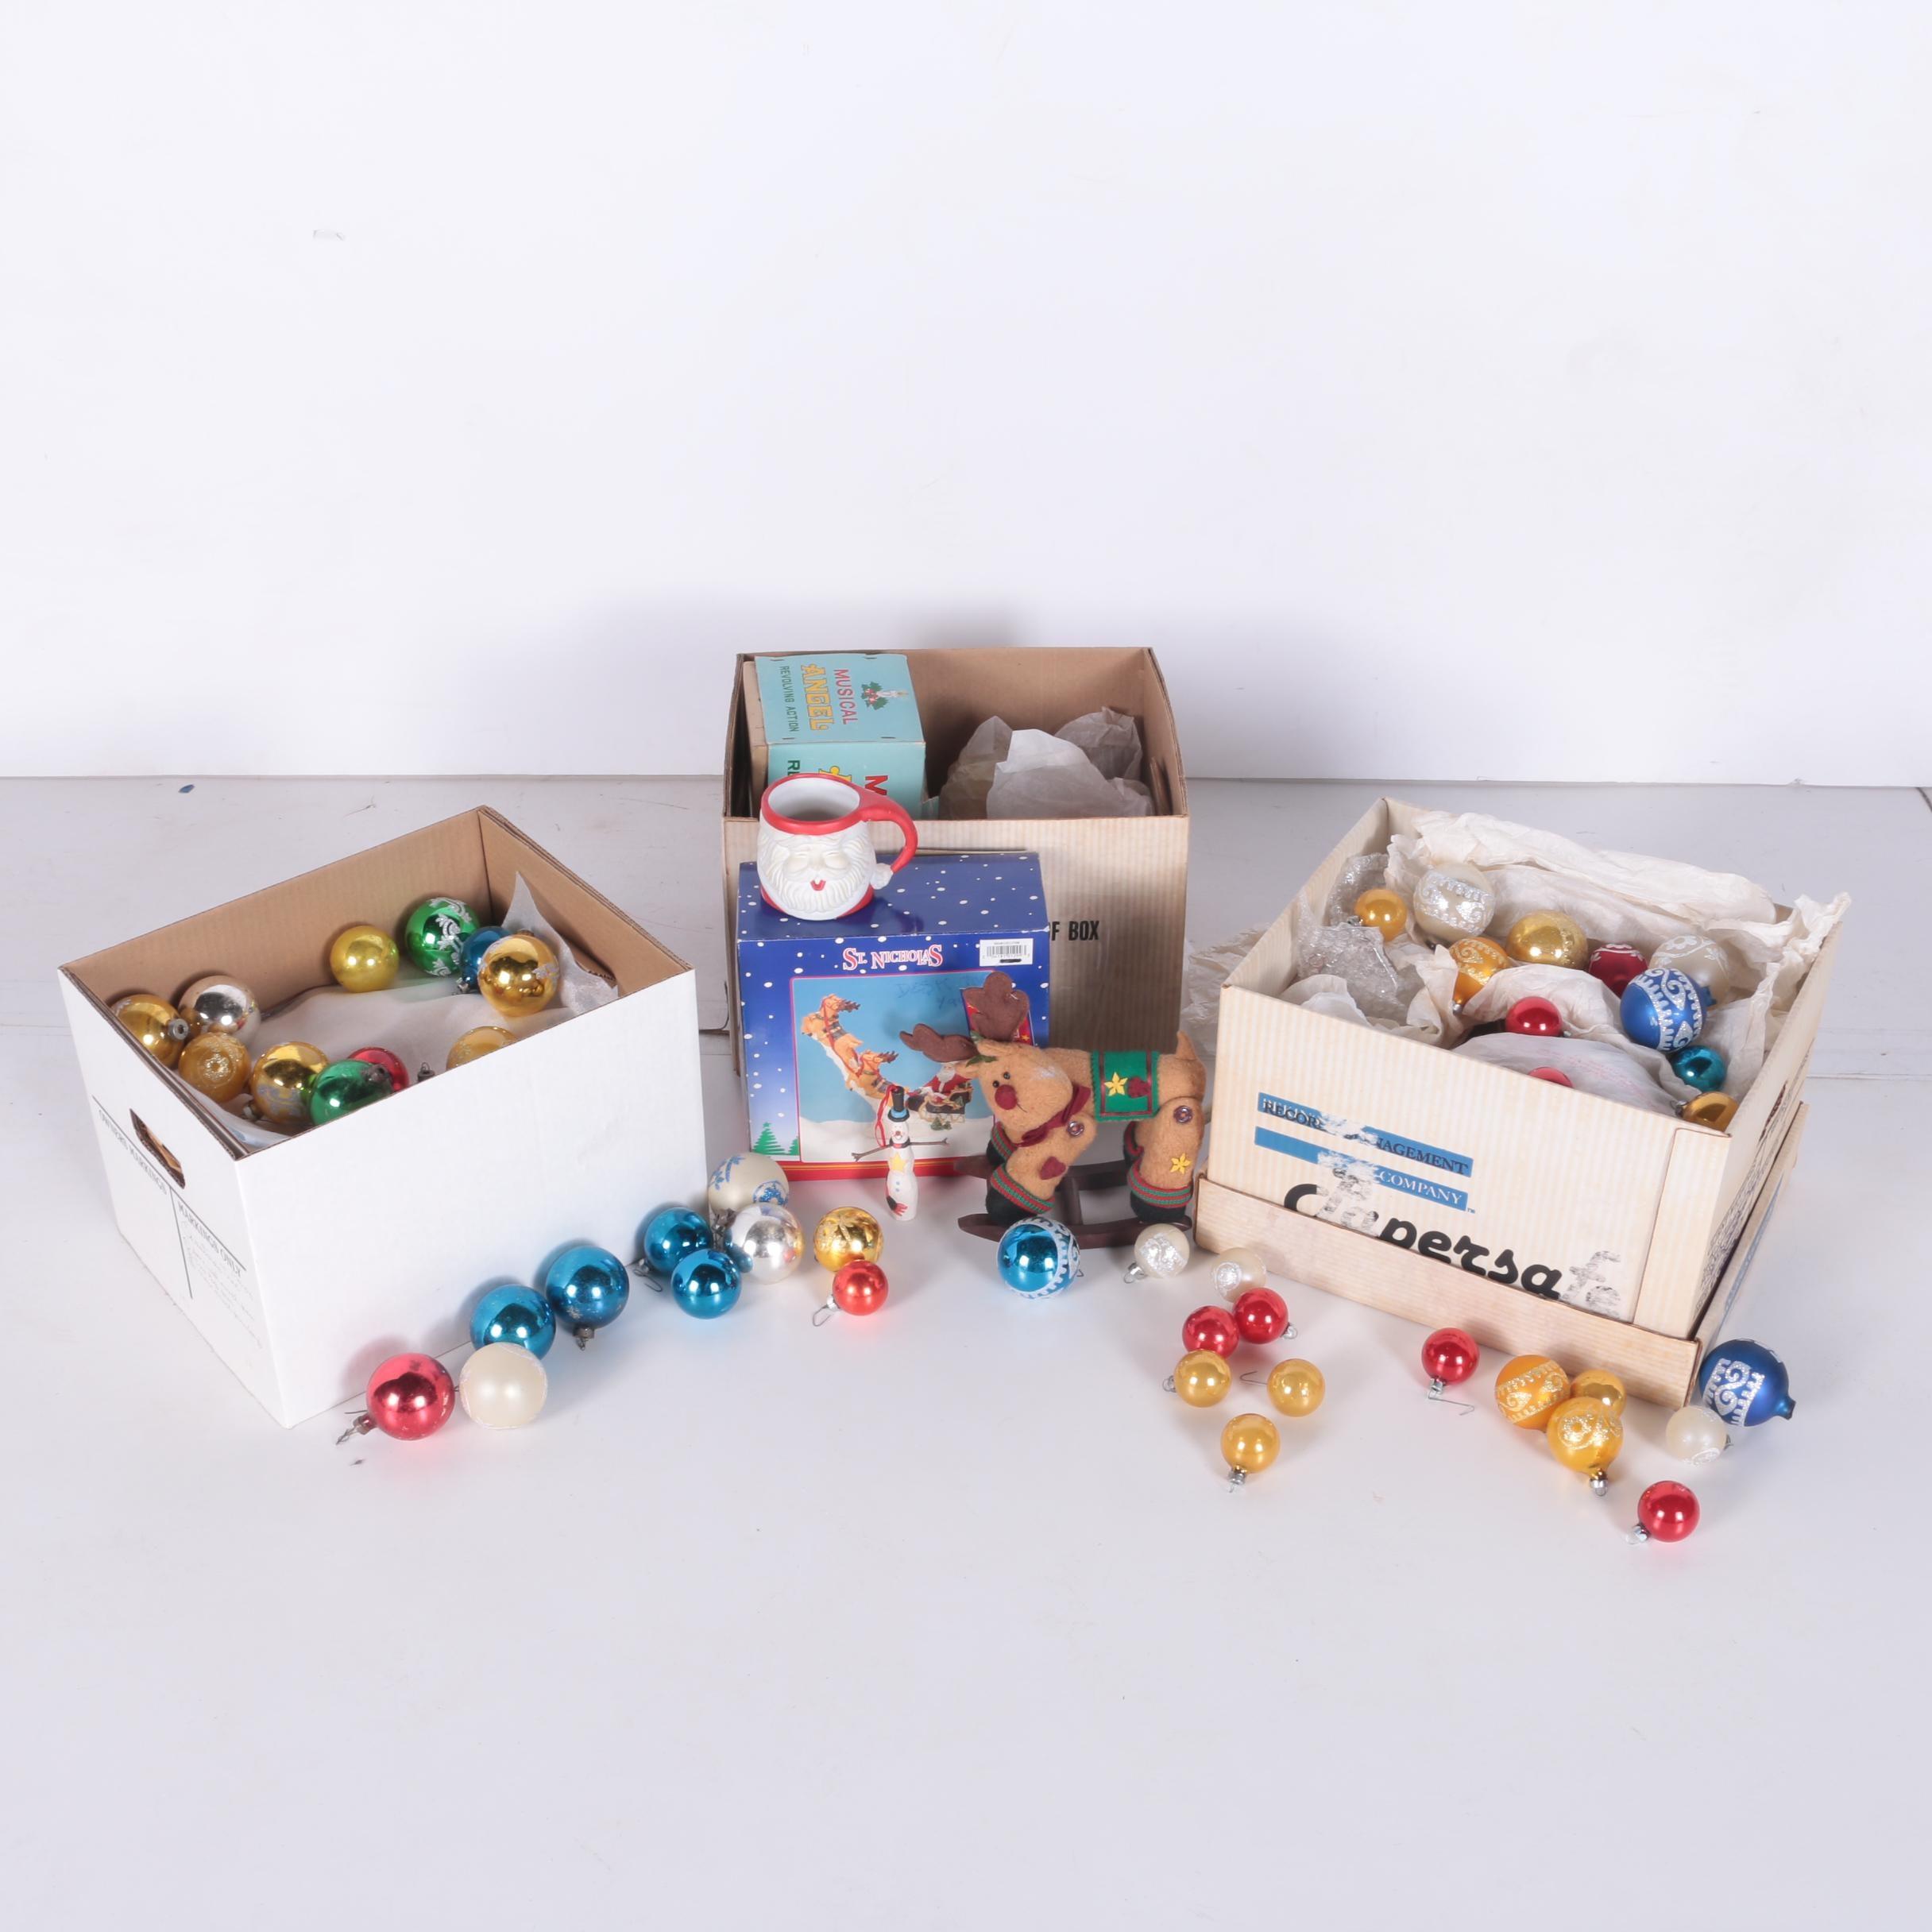 Boxes of Christmas Decor